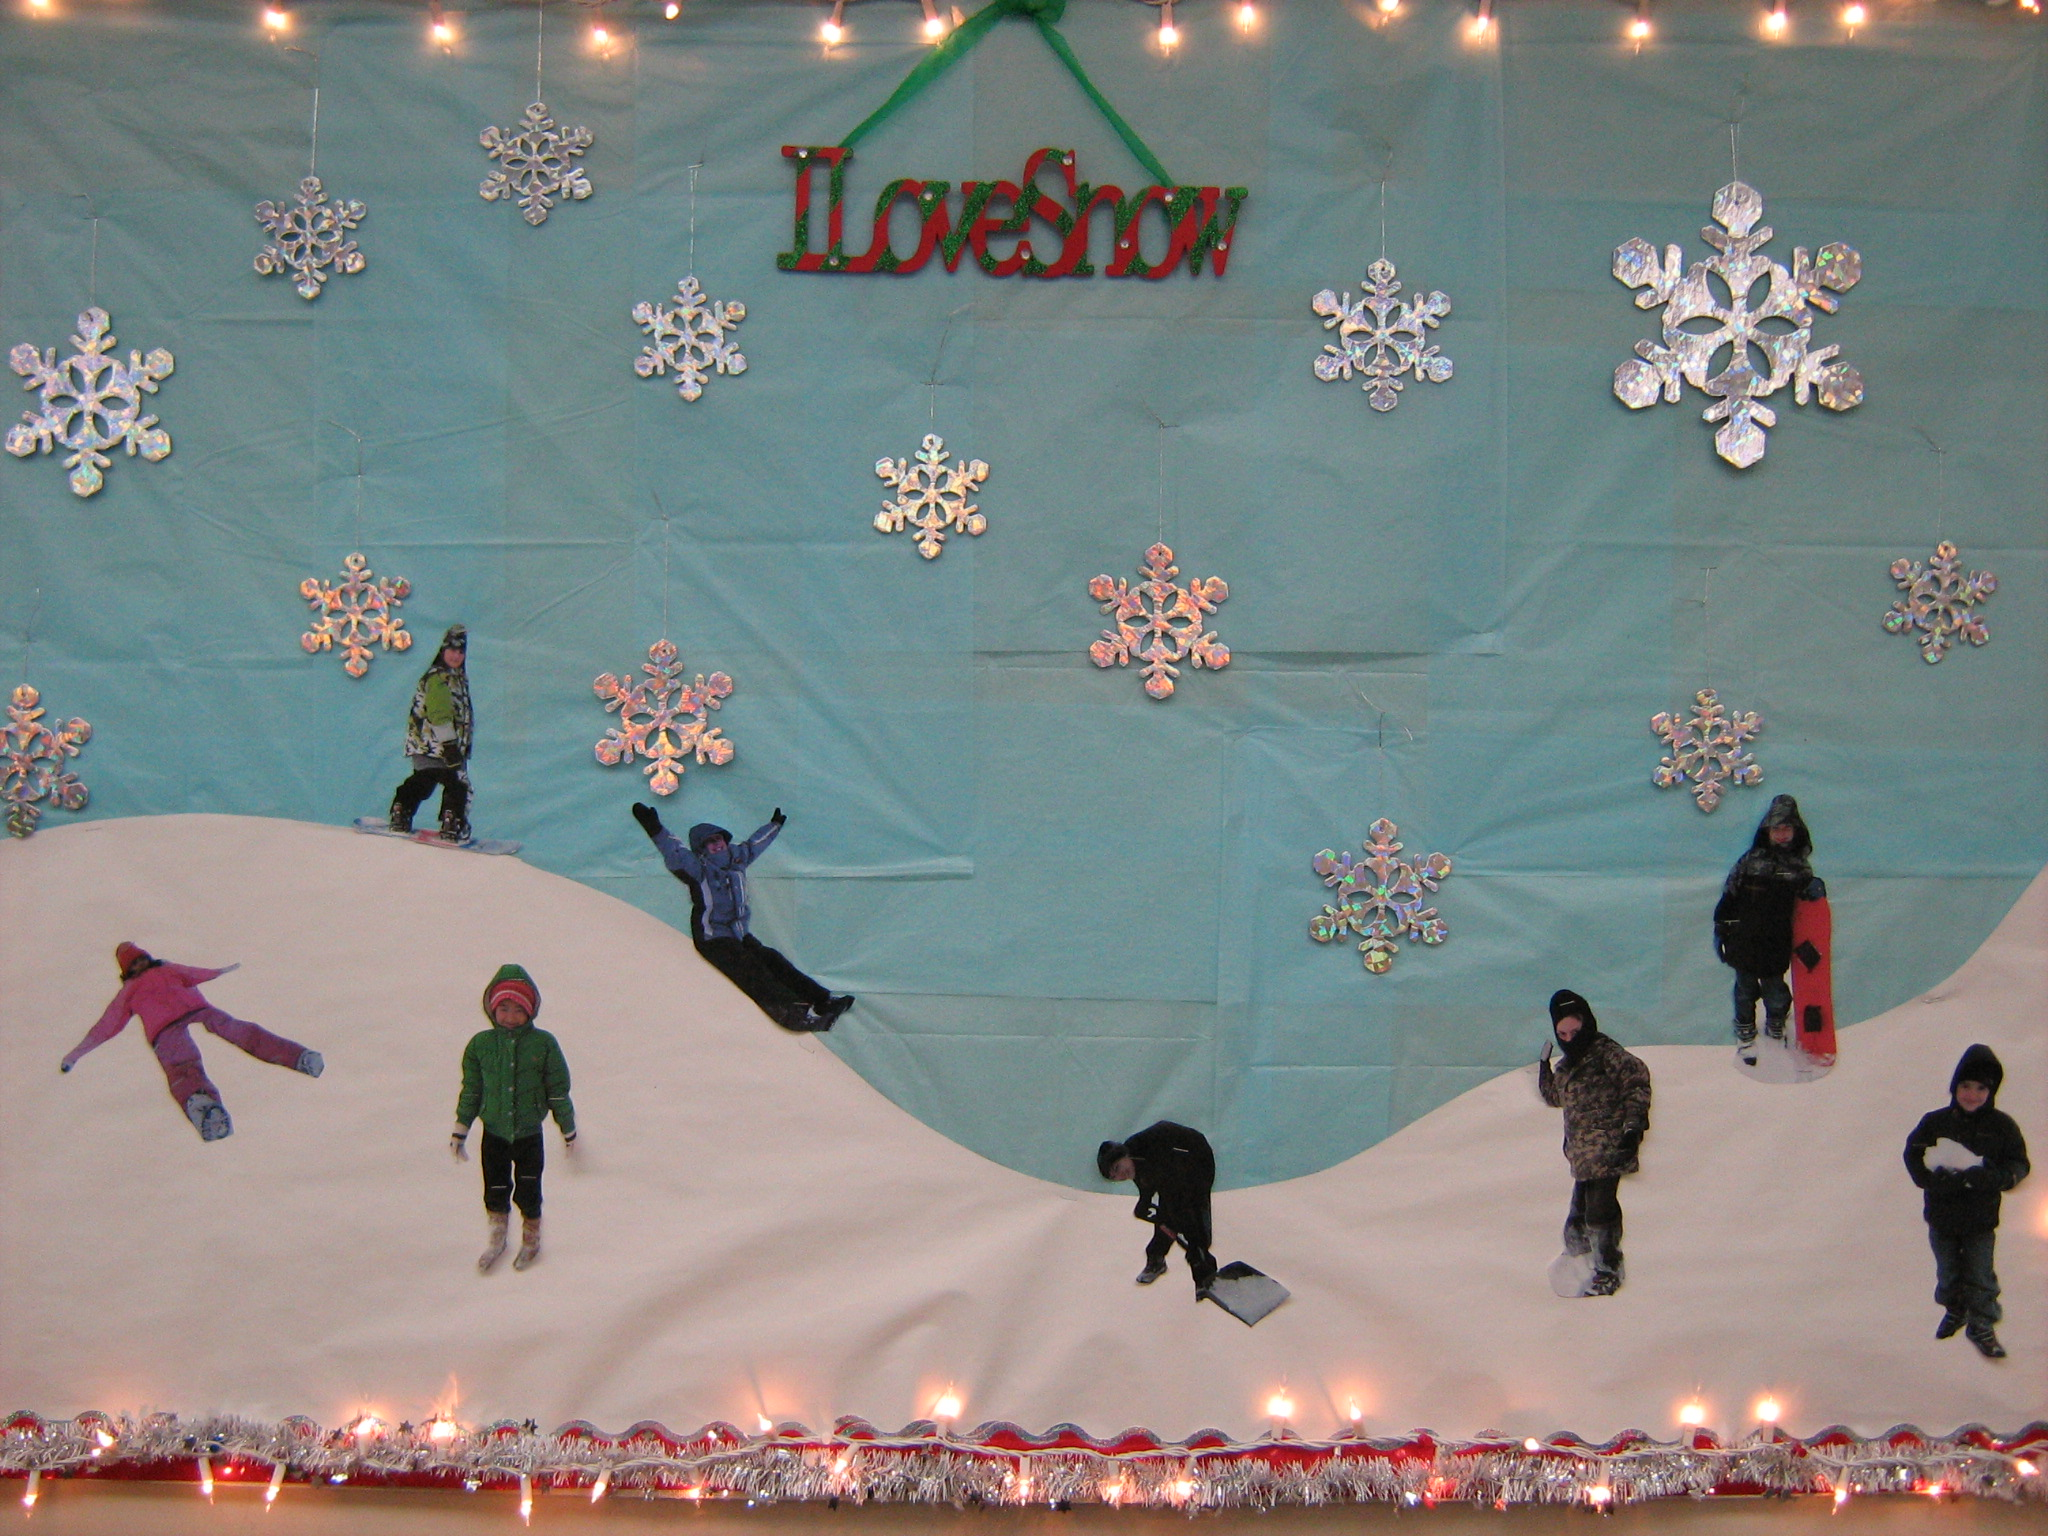 Kindergarten Winter Bulletin Board Ideas I love snow via miss g's